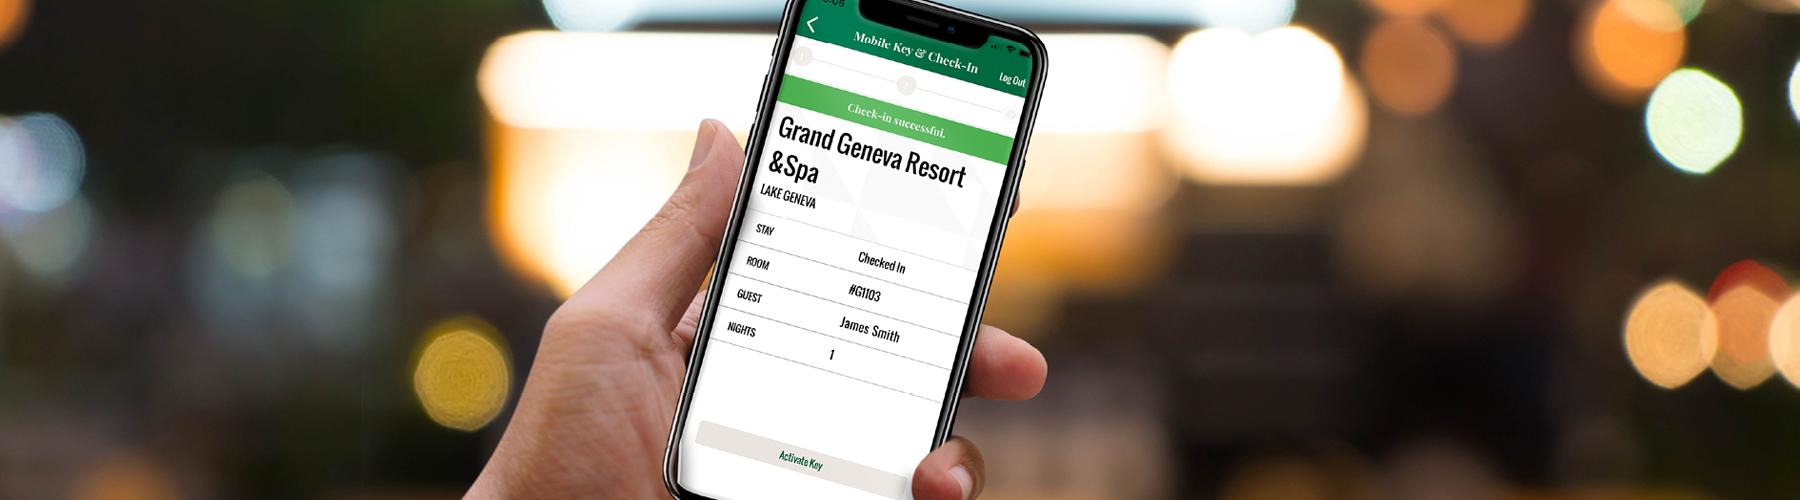 The Grand Geneva Mobile App